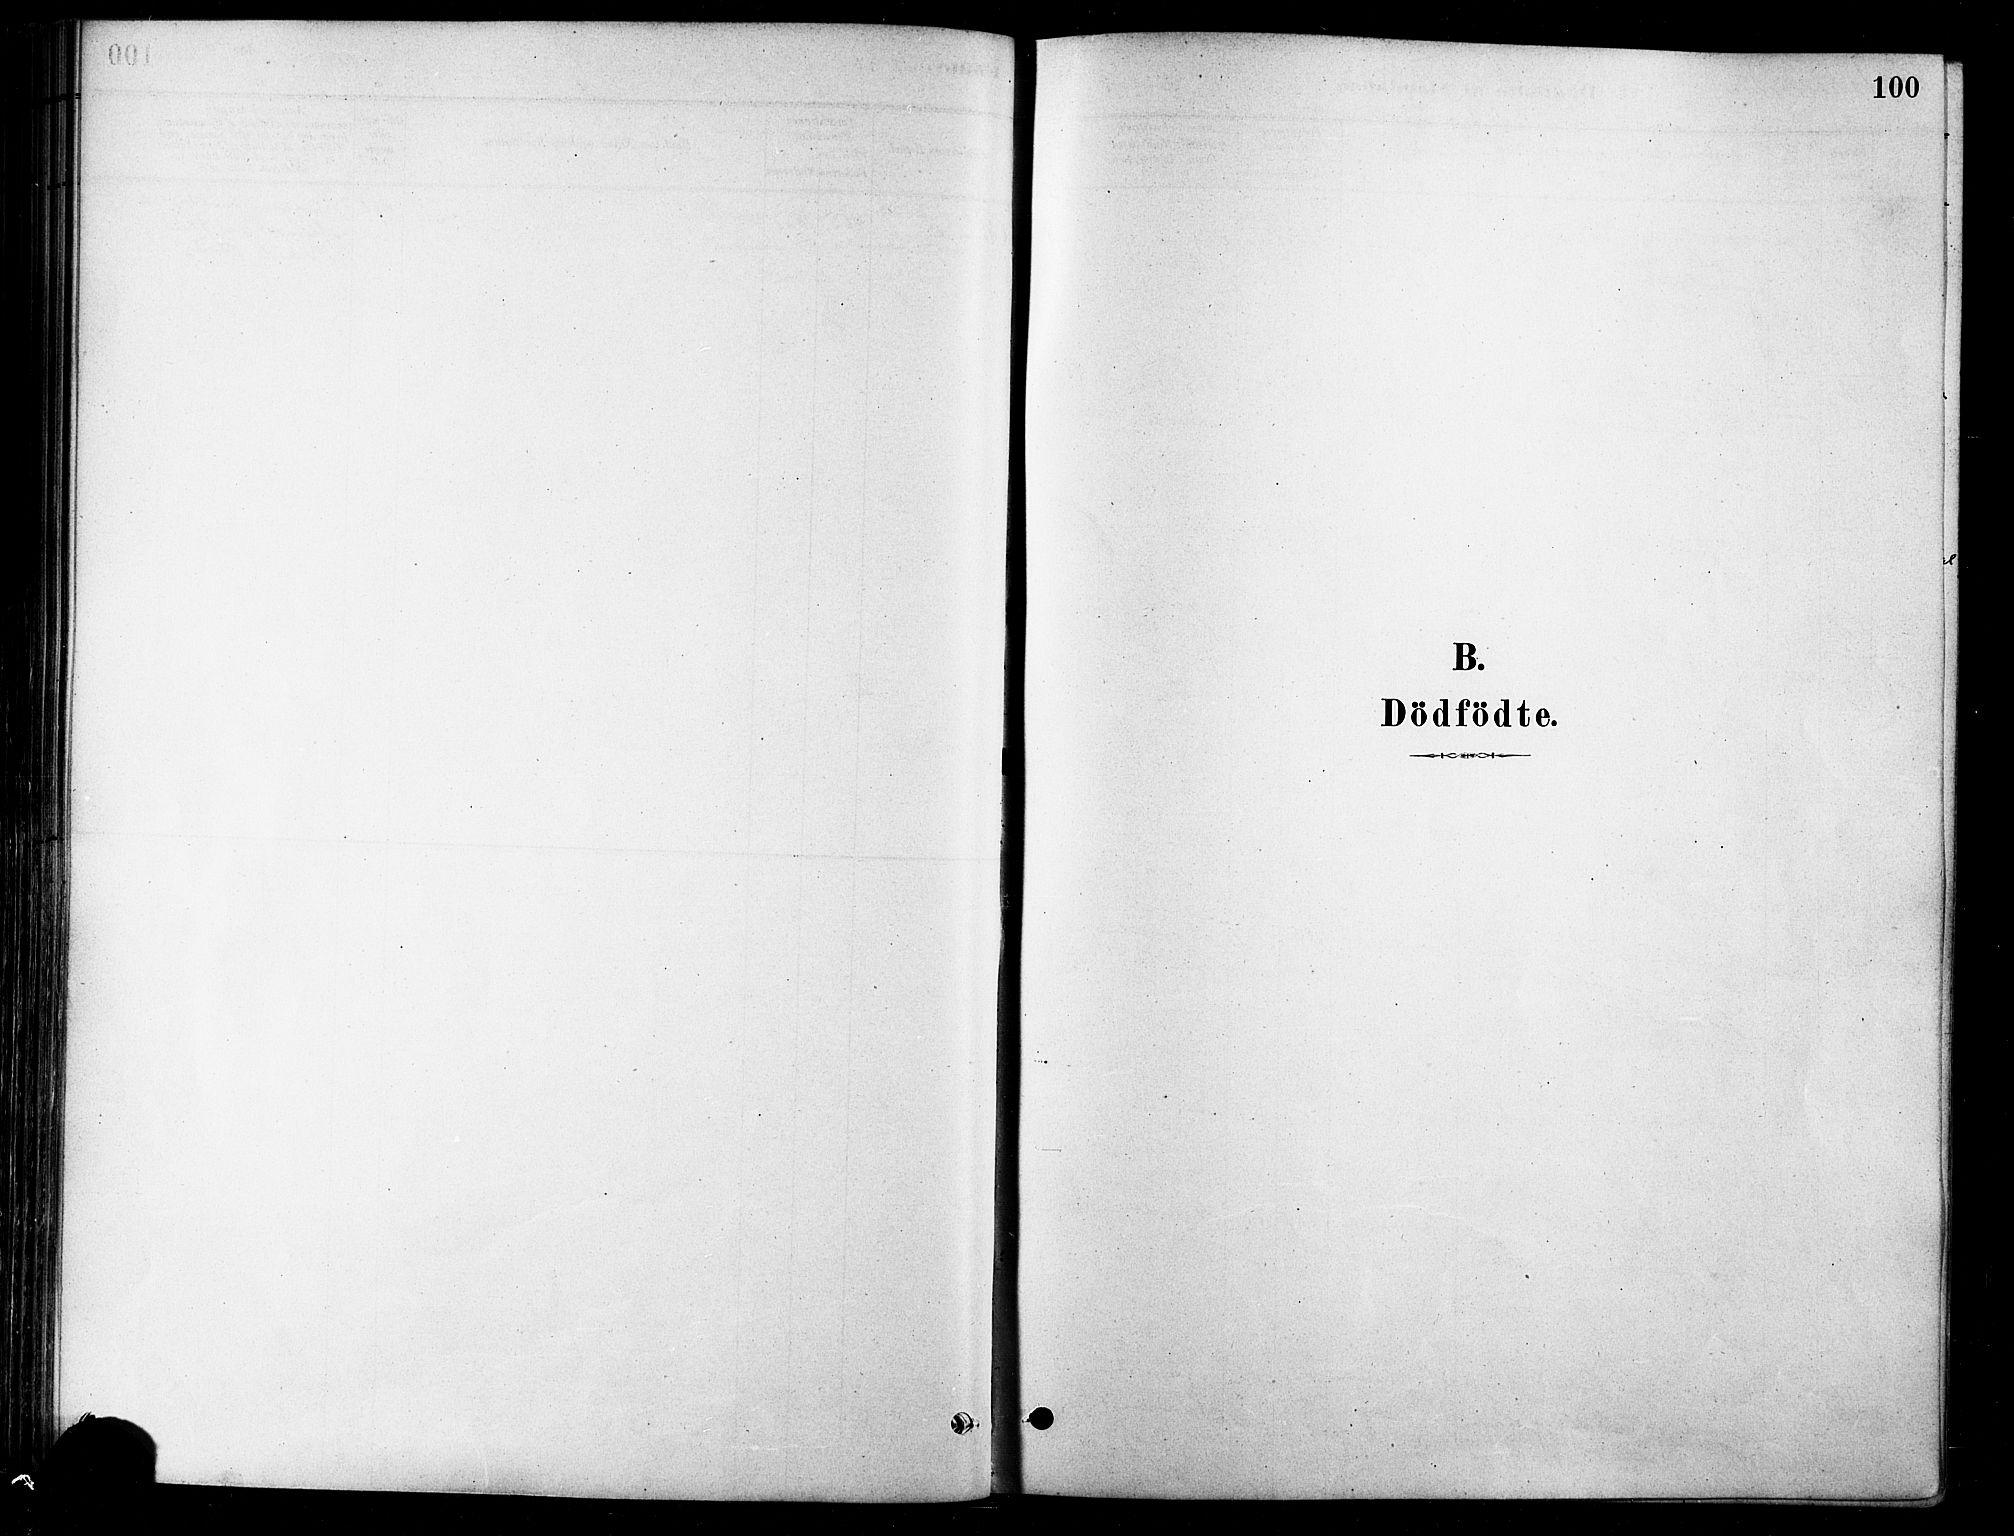 SATØ, Karlsøy sokneprestembete, H/Ha/Haa/L0006kirke: Parish register (official) no. 6, 1879-1890, p. 100